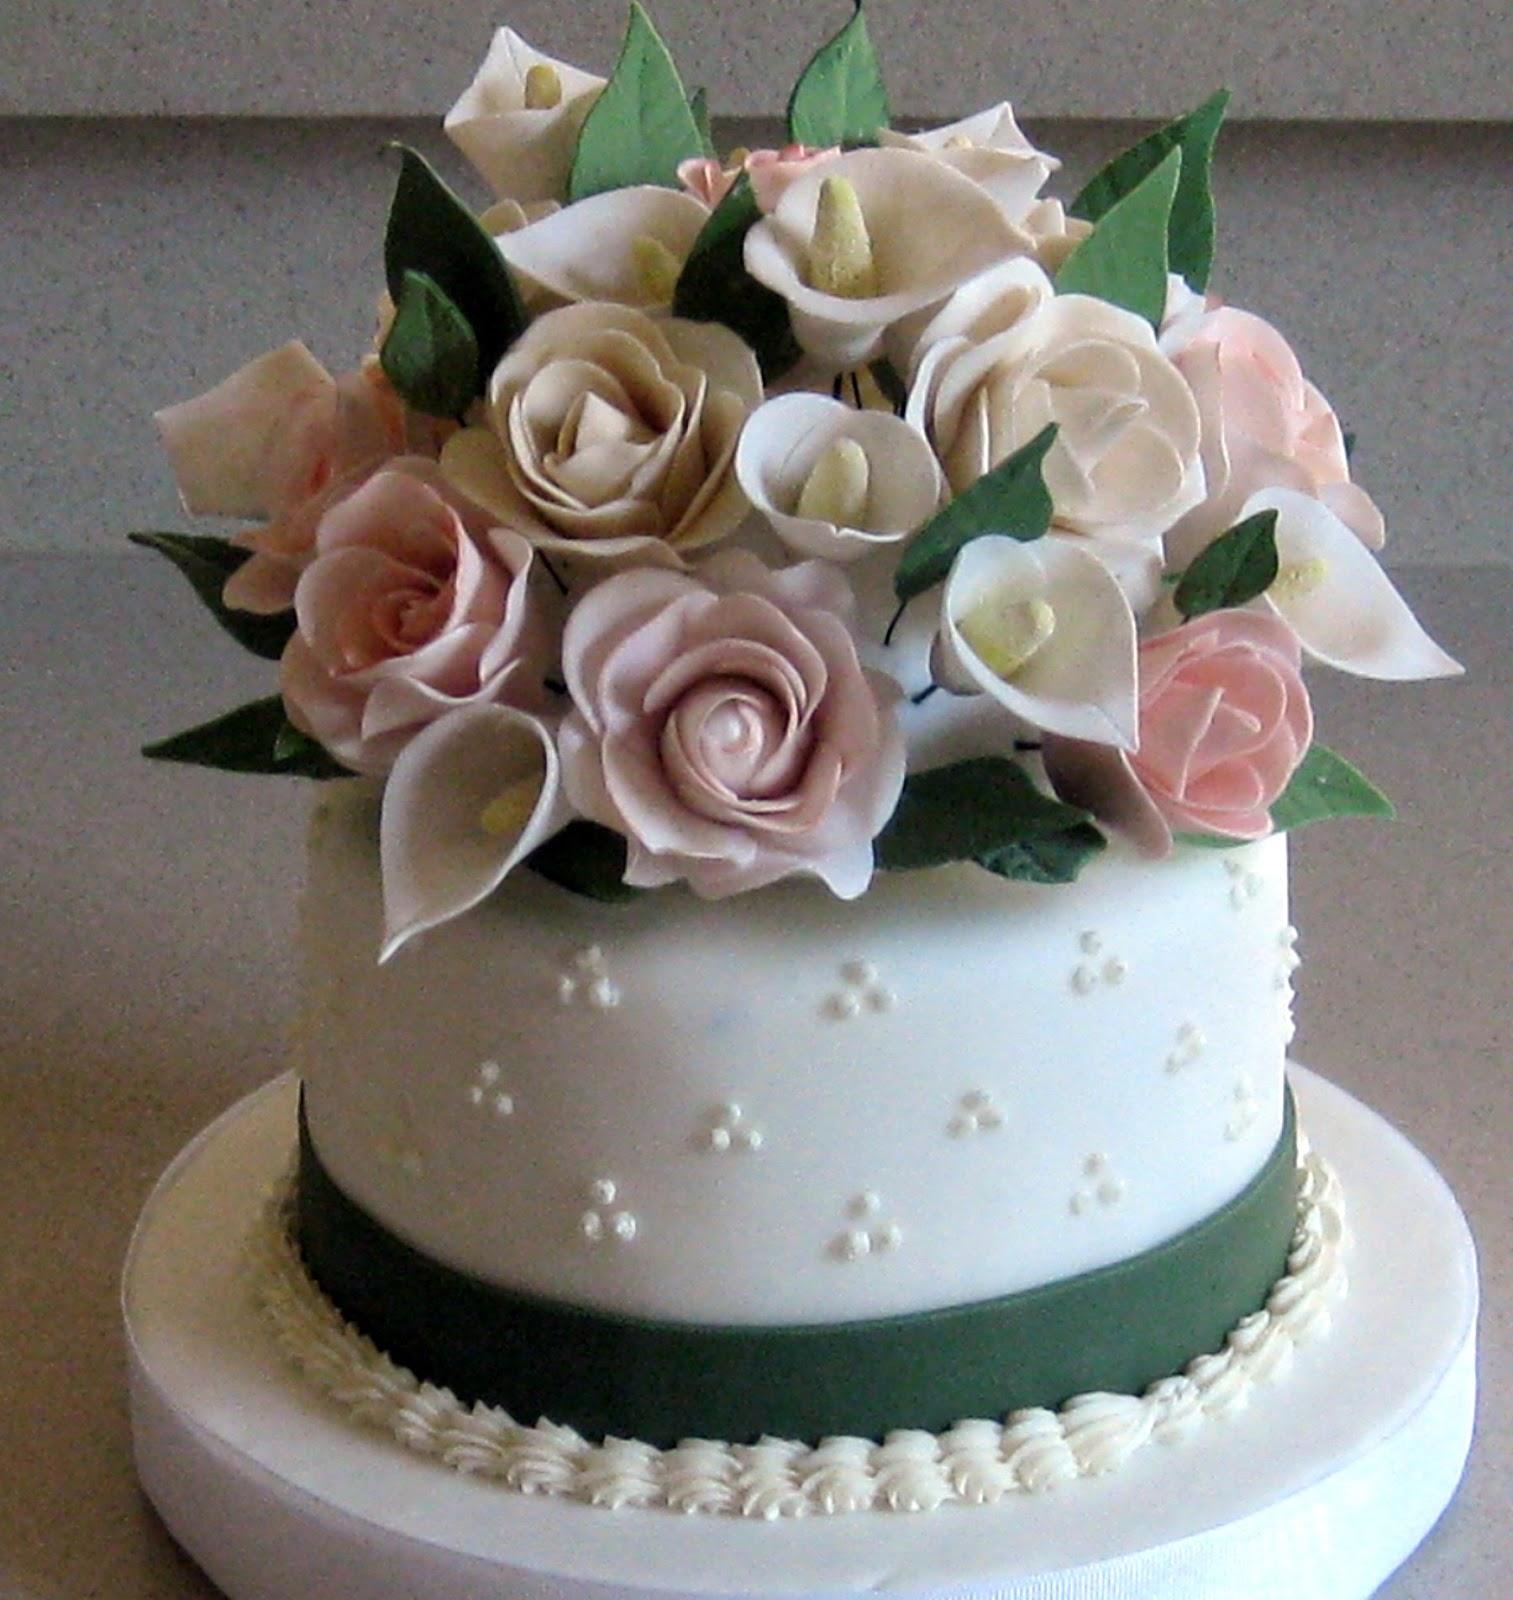 Cake As Canvas Handmade Sugar Flower Wedding Cake Topper